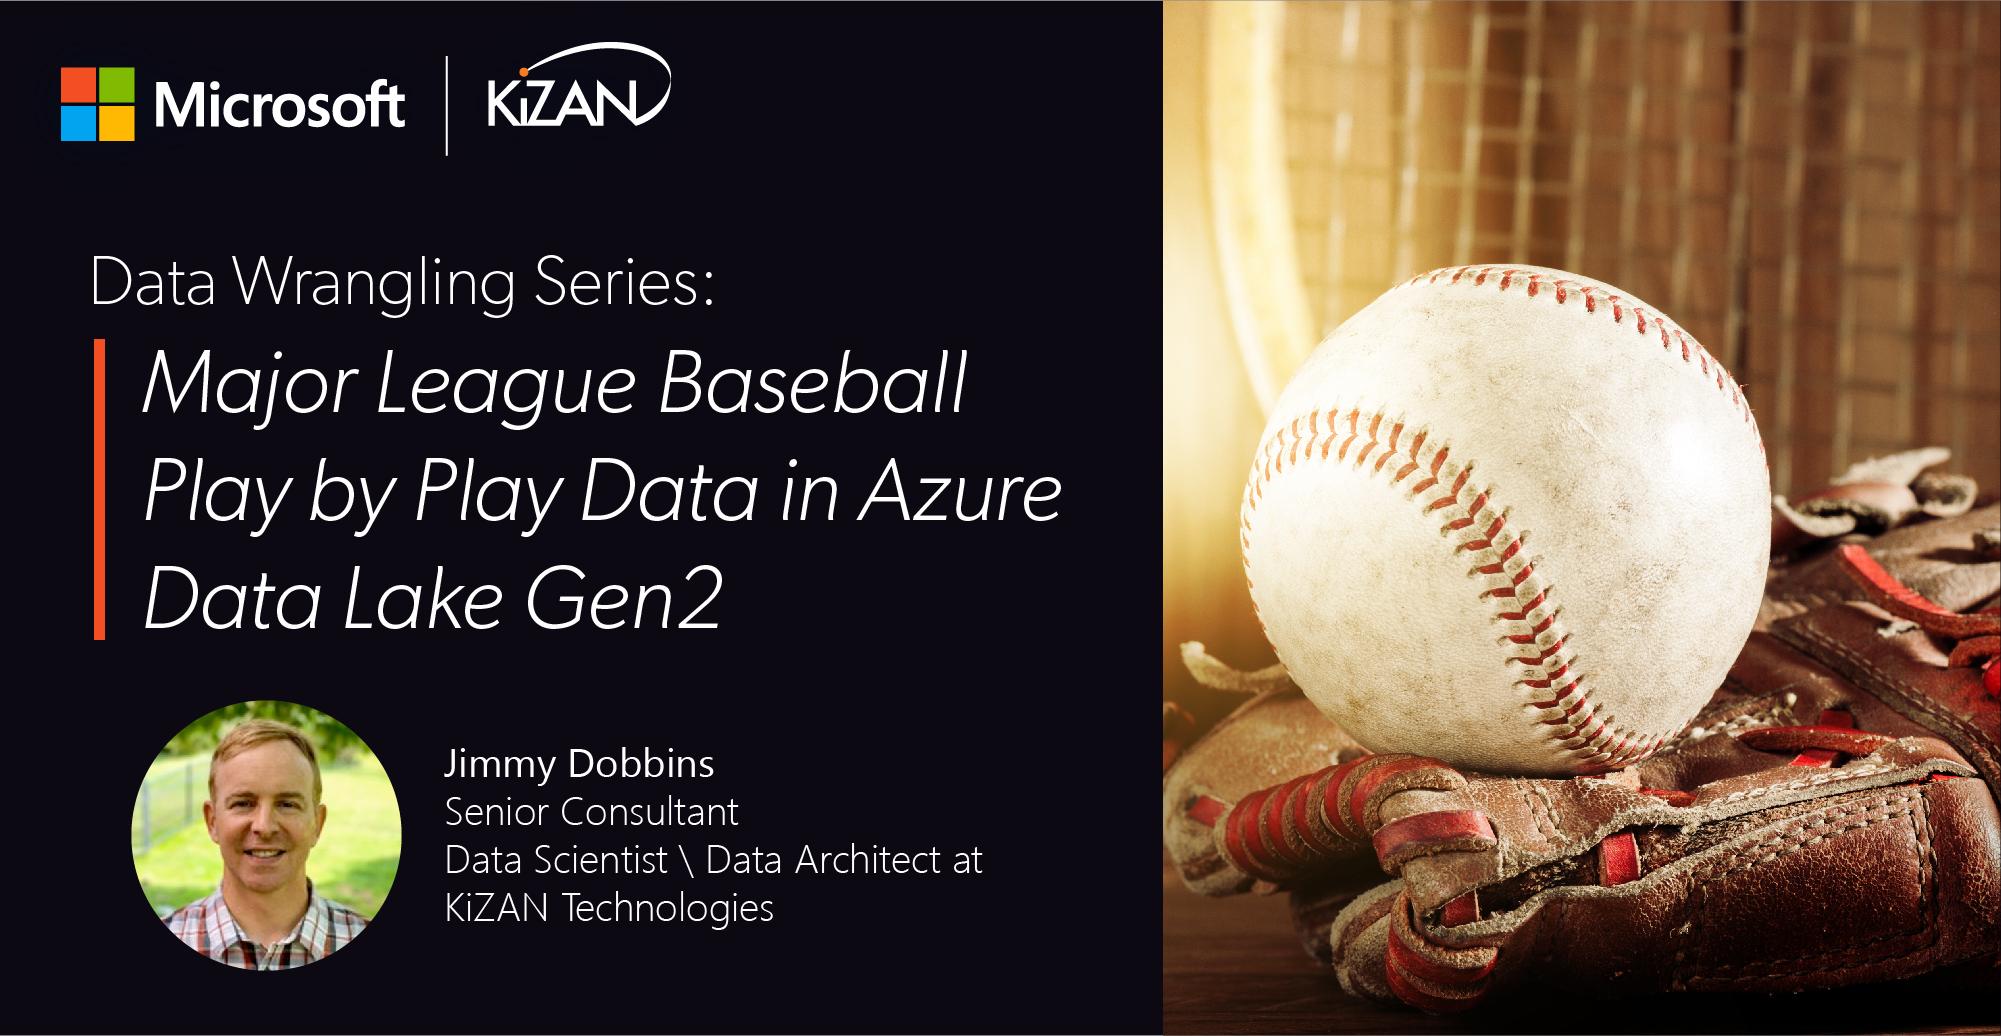 Data Wrangling Series: Major League Baseball Play by Play Data in Azure Data Lake Gen2